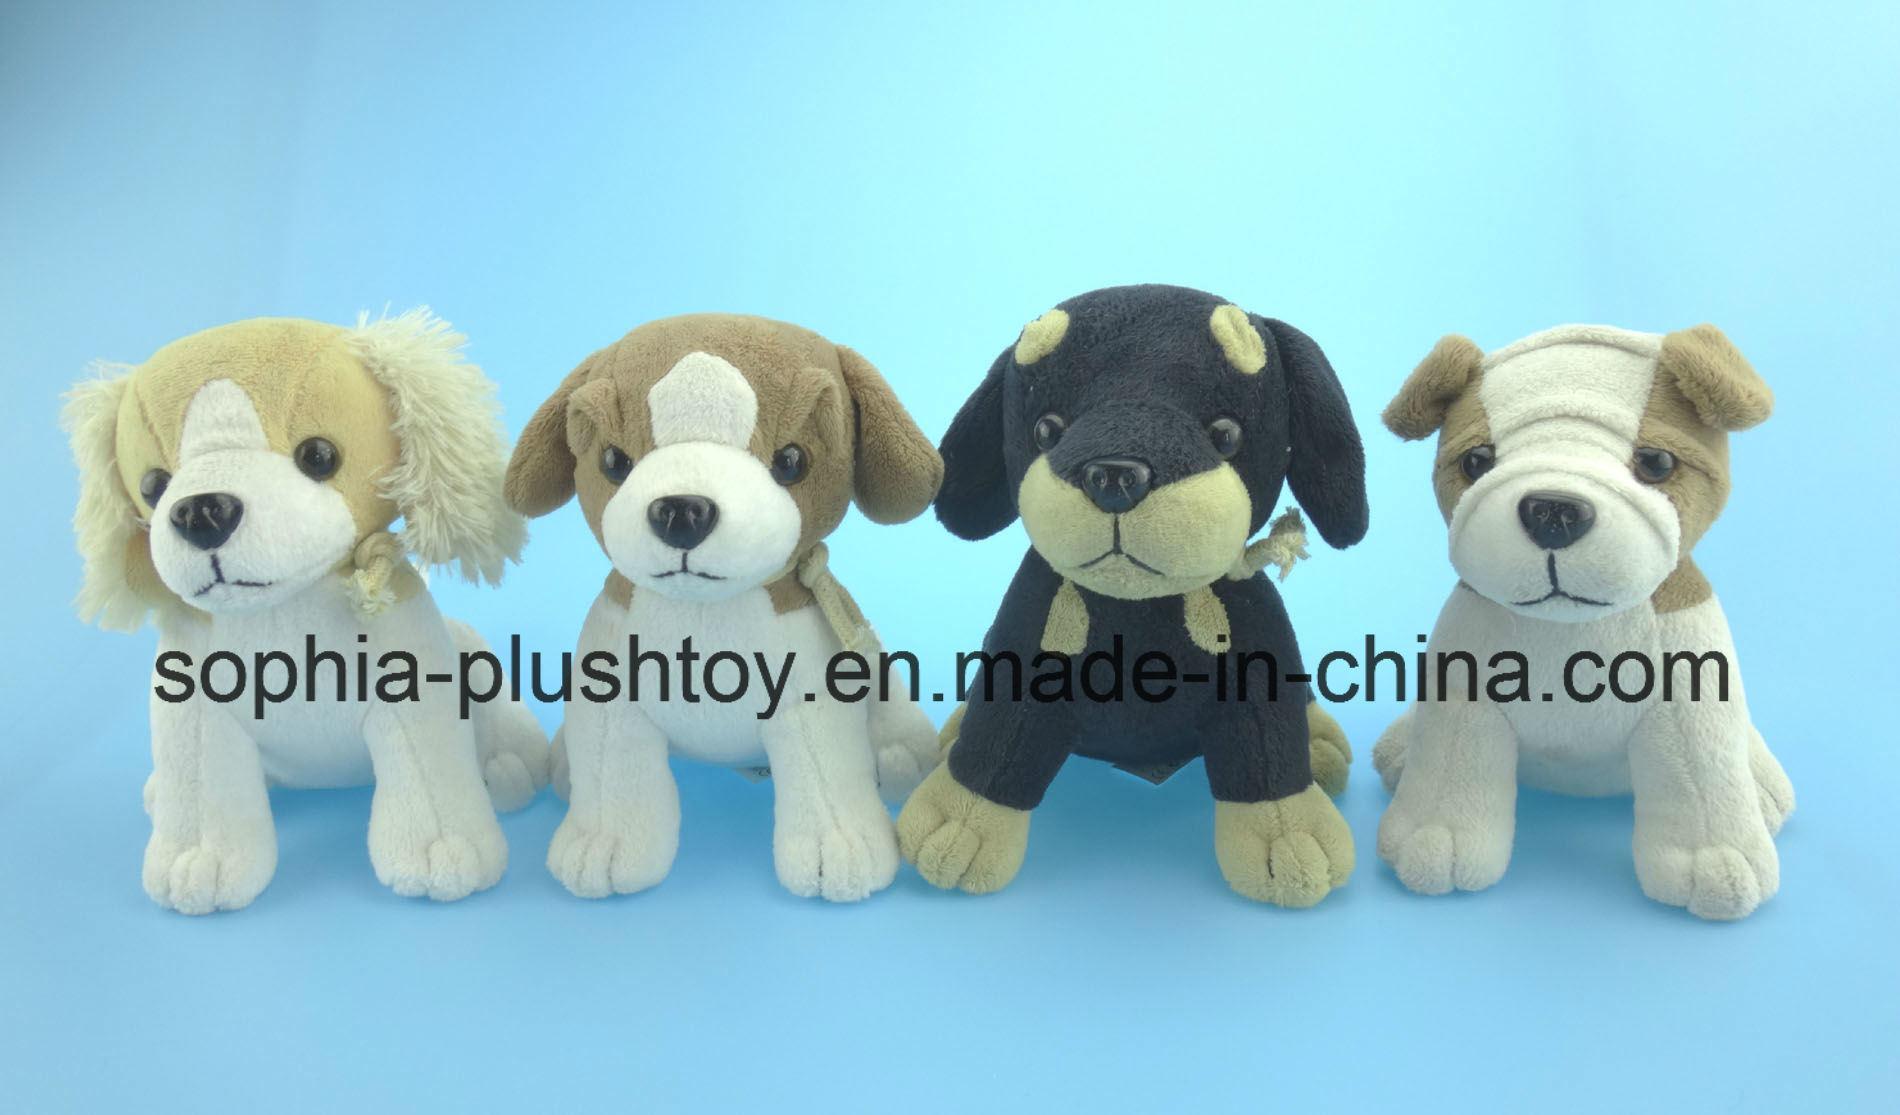 Soft Stuffed Plush Dog Toy 4 Asst.